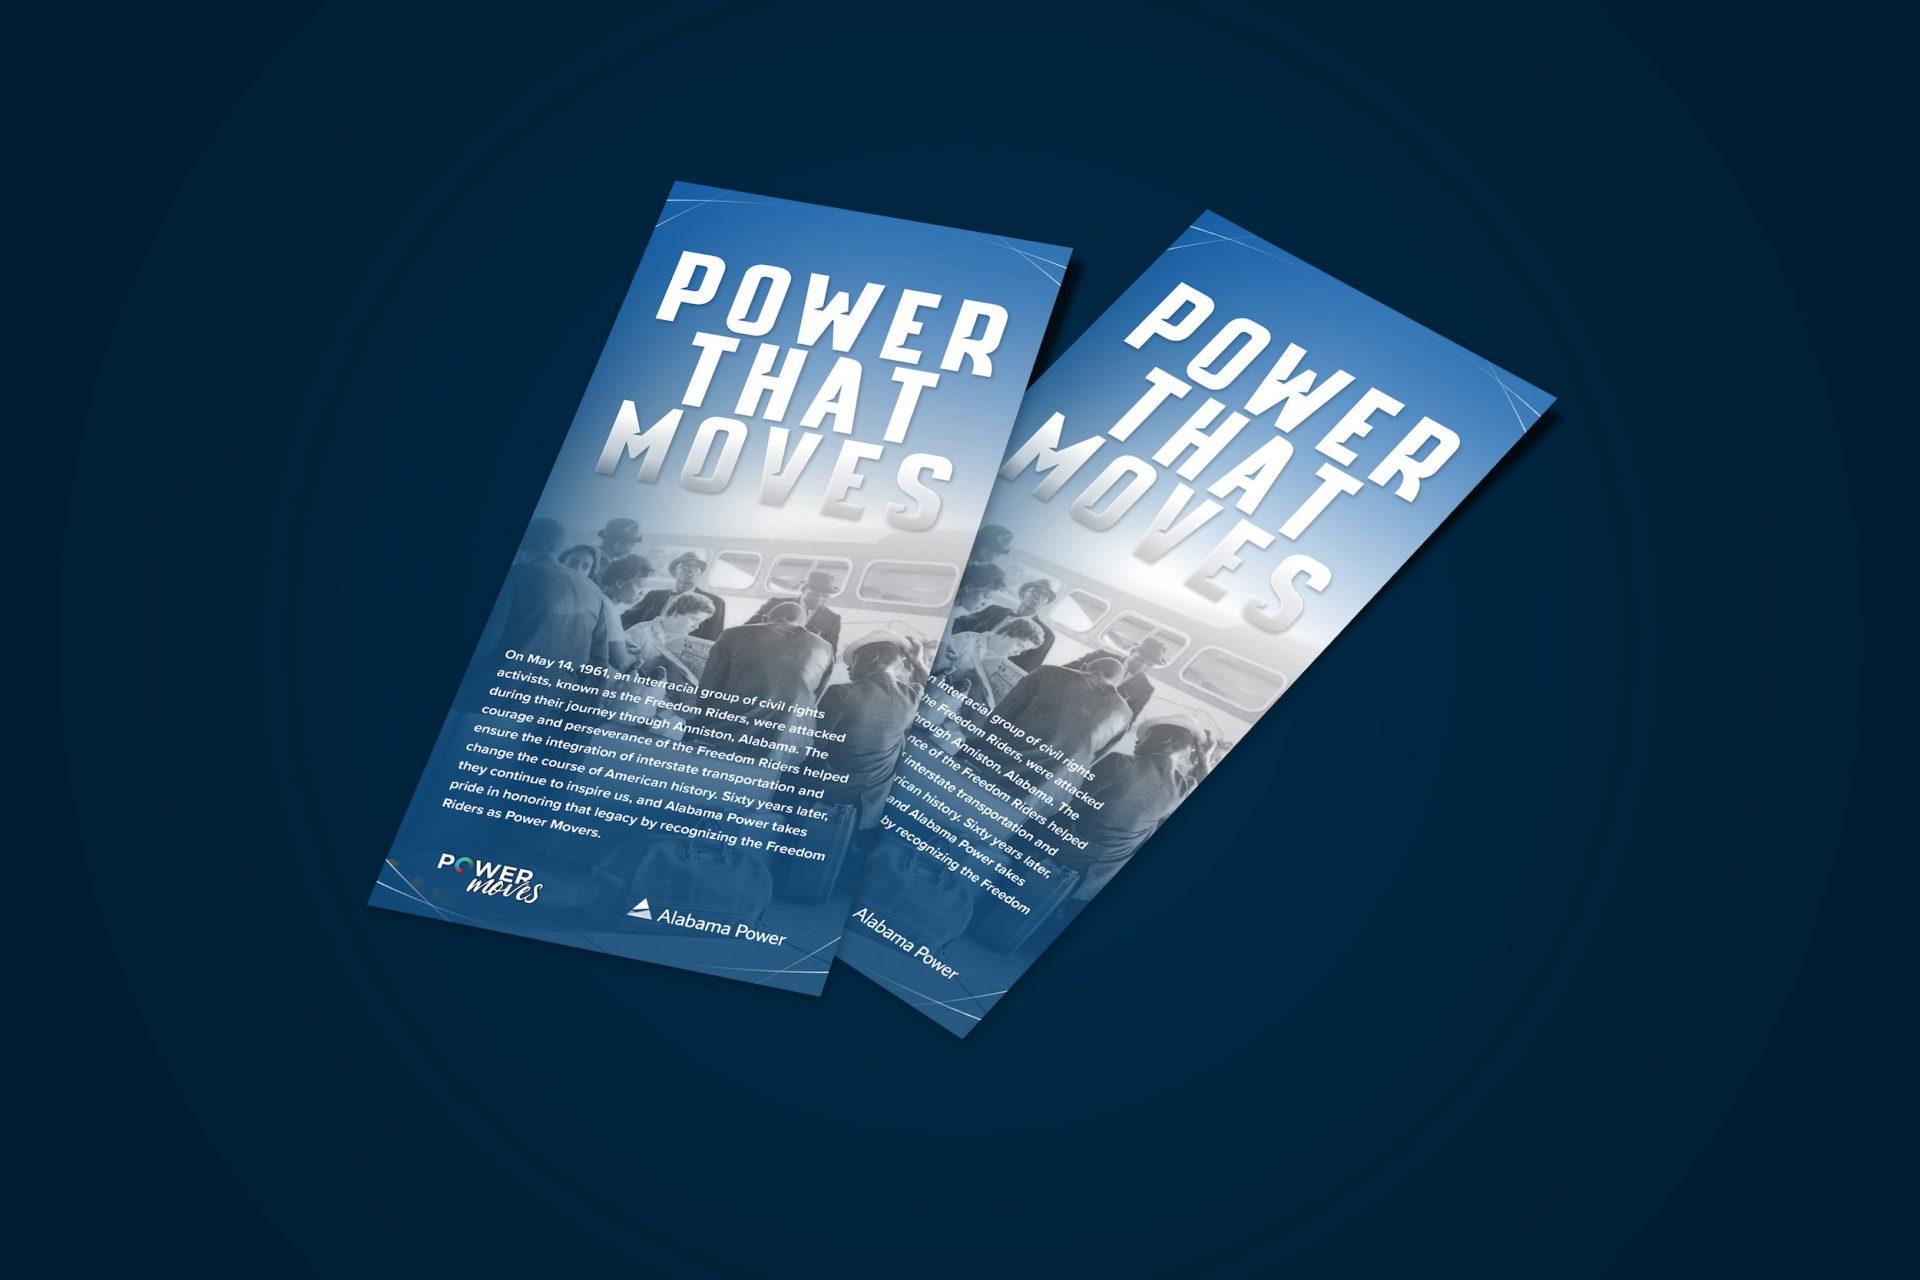 Power-Moves-MockUp_2